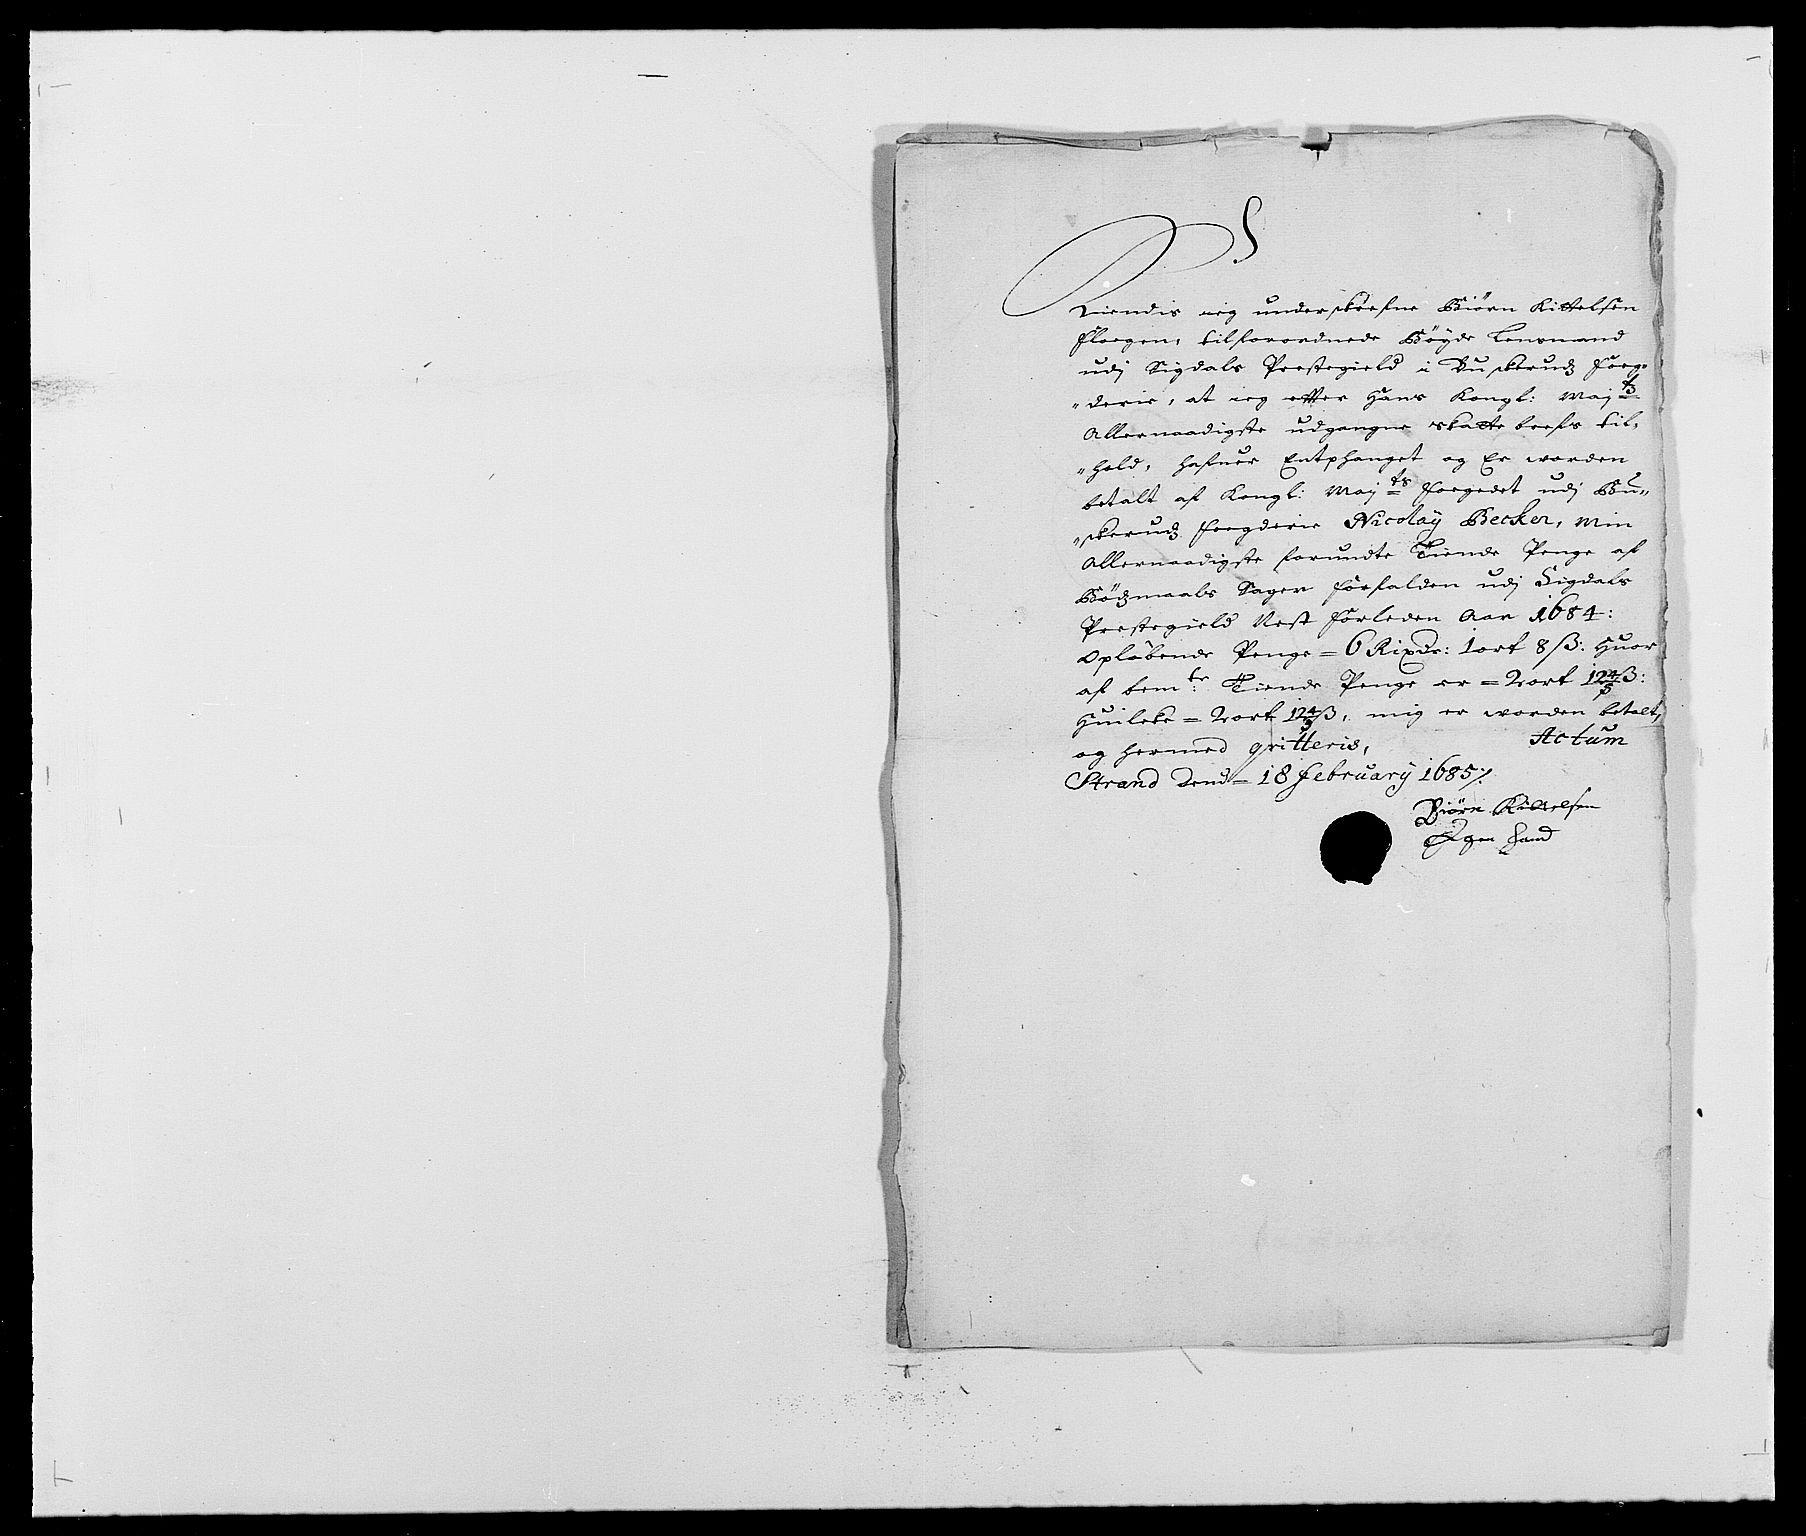 RA, Rentekammeret inntil 1814, Reviderte regnskaper, Fogderegnskap, R25/L1677: Fogderegnskap Buskerud, 1683-1684, s. 340